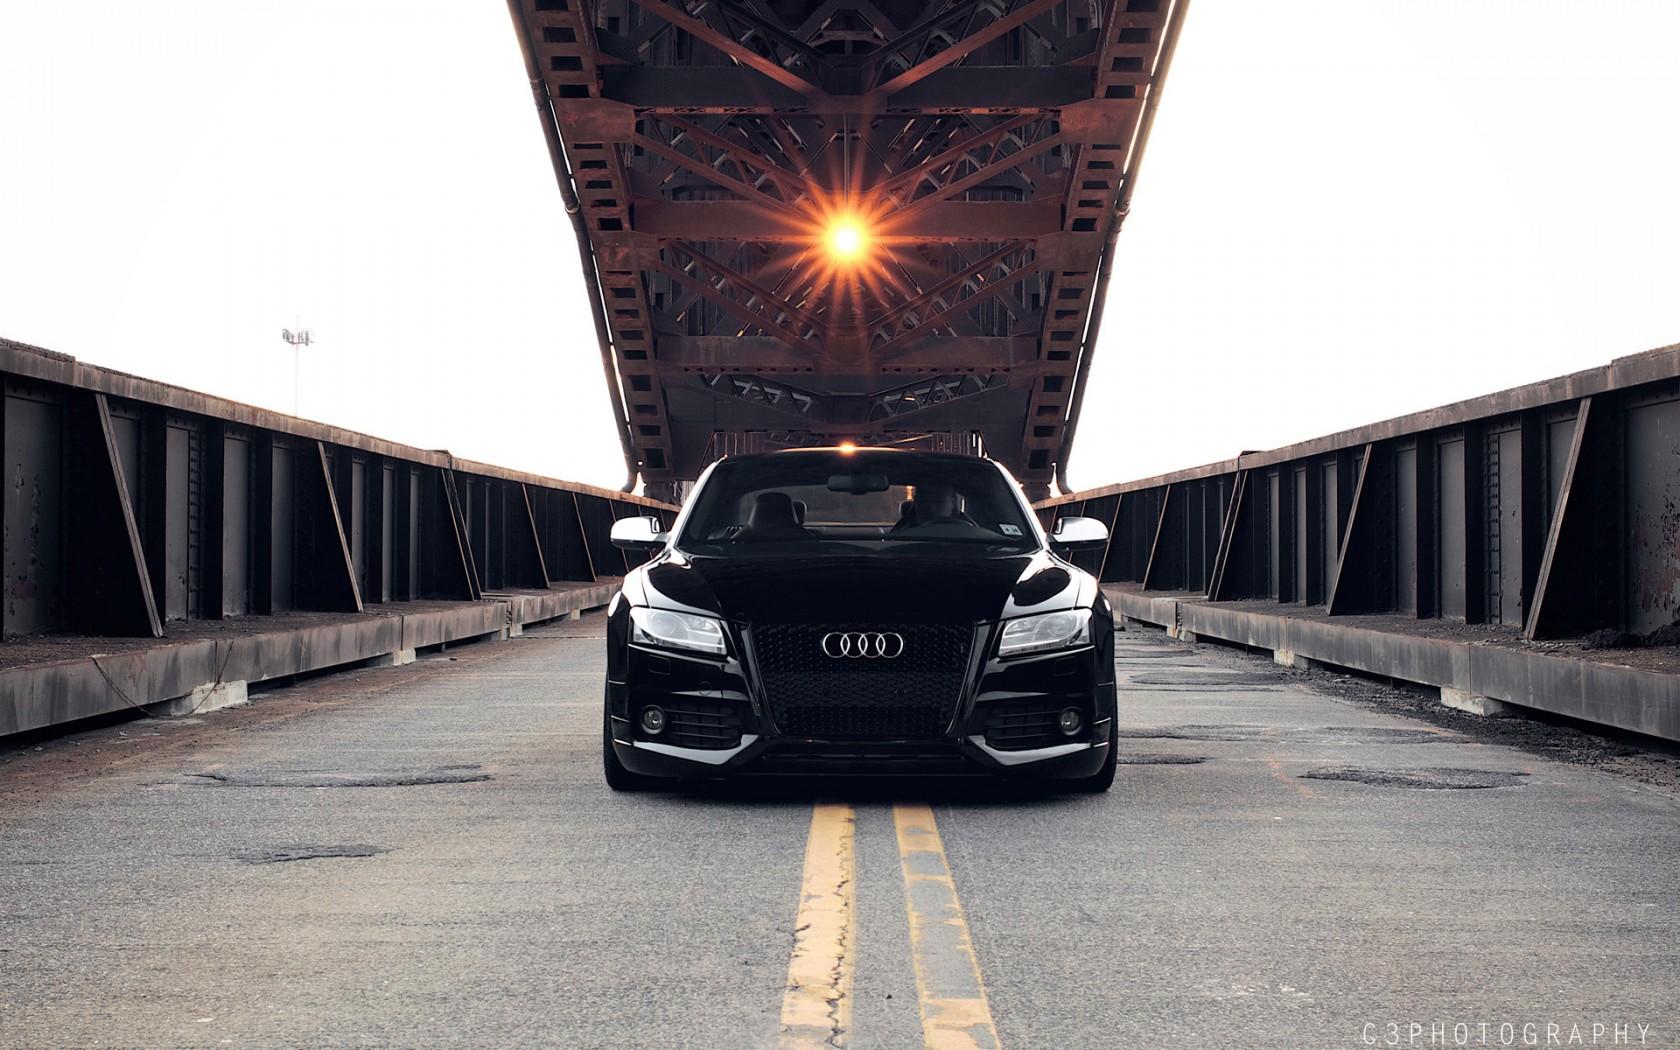 Hummer Car Wallpapers Black Black Audi S5 Wallpaper Hd Car Wallpapers Id 2597